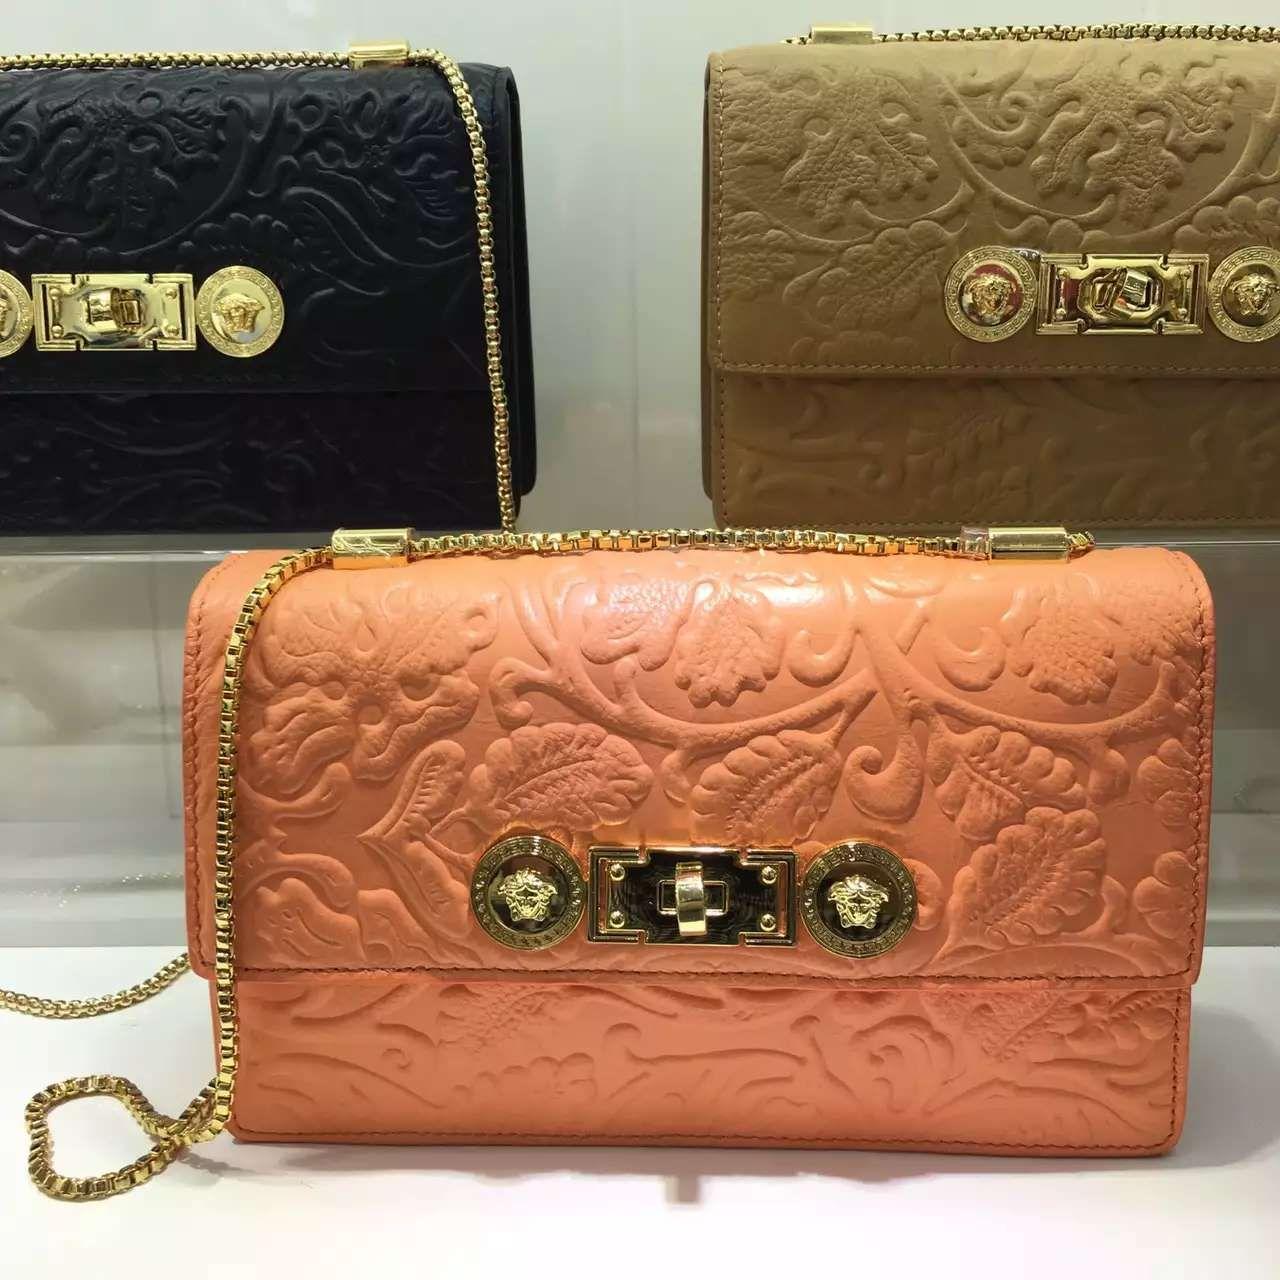 versace Bag, ID : 63309(FORSALE:a@yybags.com), versace handbags for women, versace day backpacks, cheap mens versace, versace briefcase laptop, versace laptop briefcase, versace expandable briefcase, versace men wallet brands, versace most popular backpacks, versace designer handbags for sale, versace leather wallets, versace black handbags #versaceBag #versace #versace #pocket #wallet